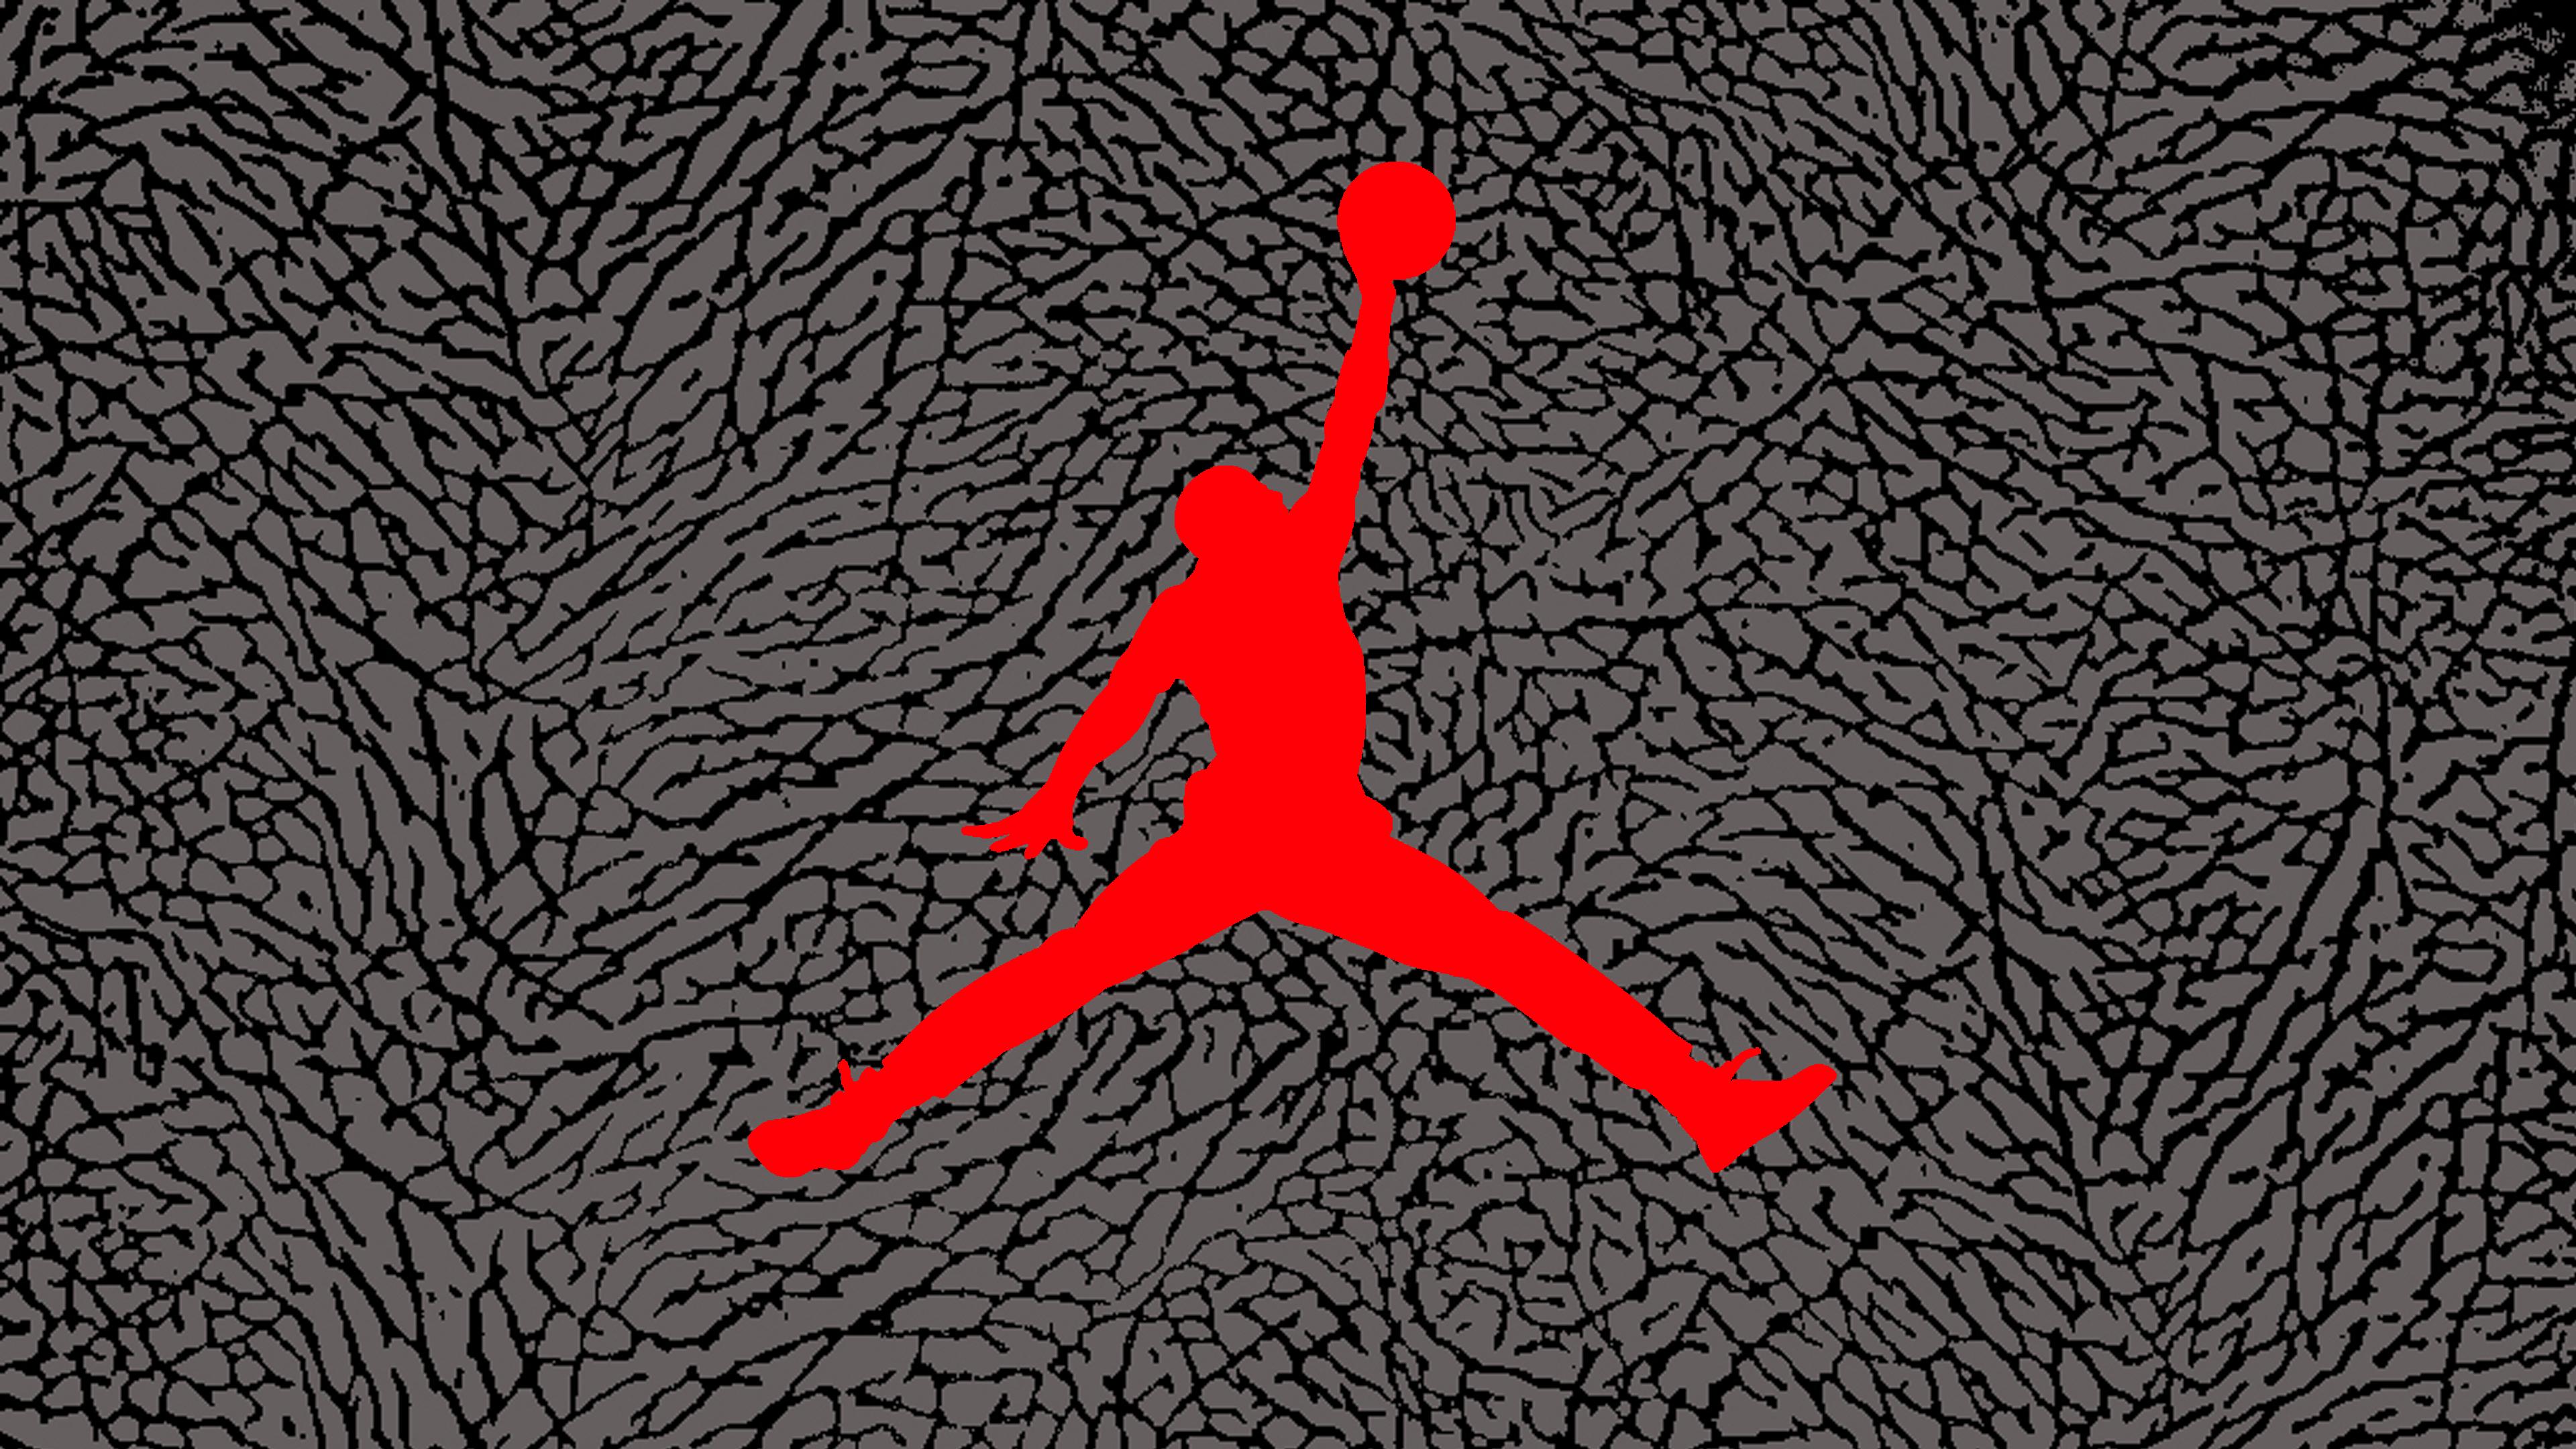 Air Jordan Backgrounds Ideas for the House Jordan background 3840x2160